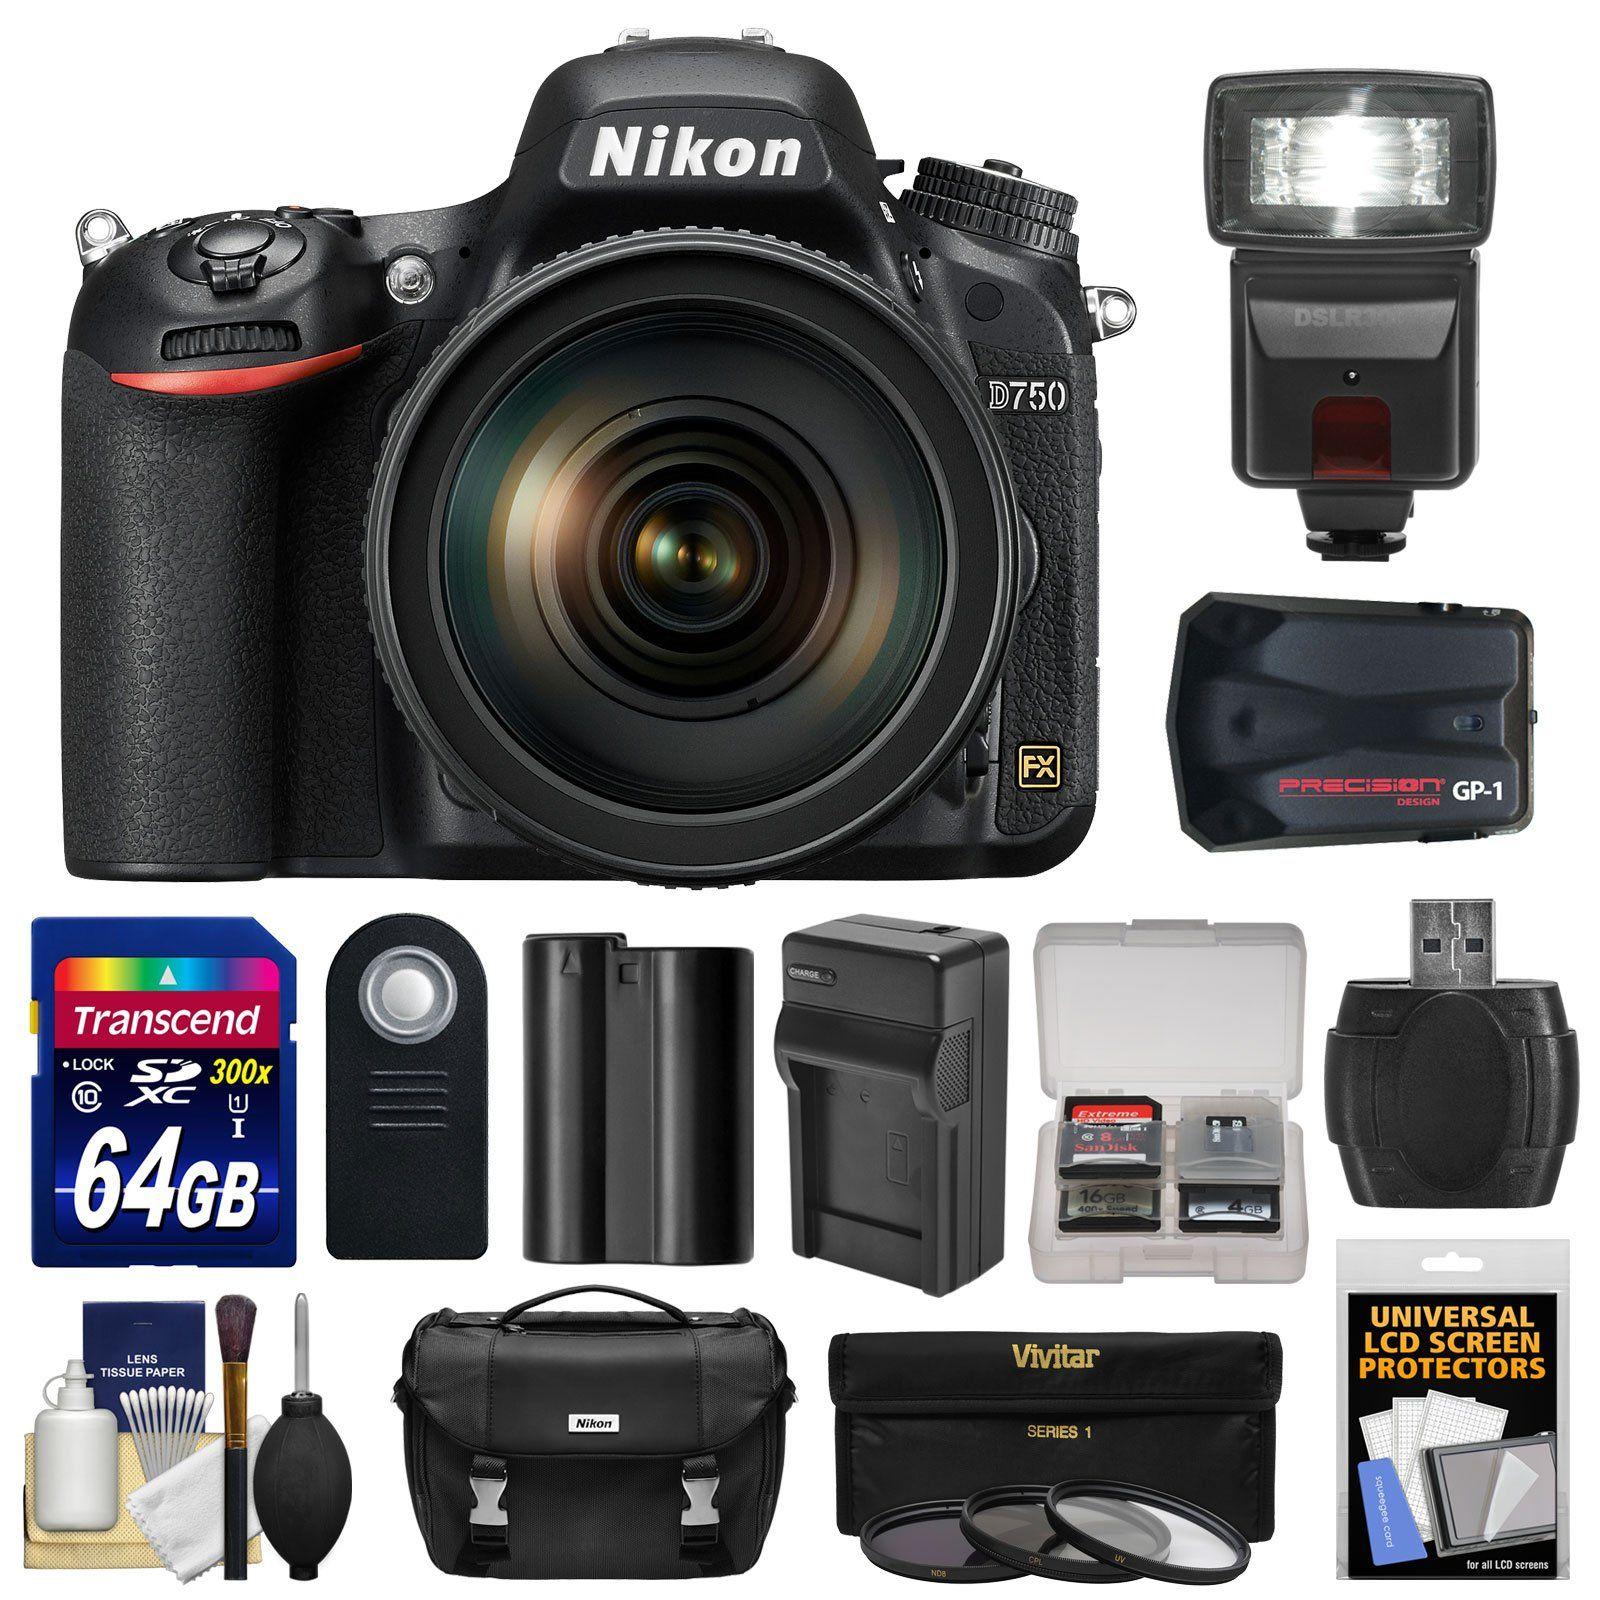 Nikon D750 Digital SLR Camera Kit with 24 120mm f 4 VR Lens and